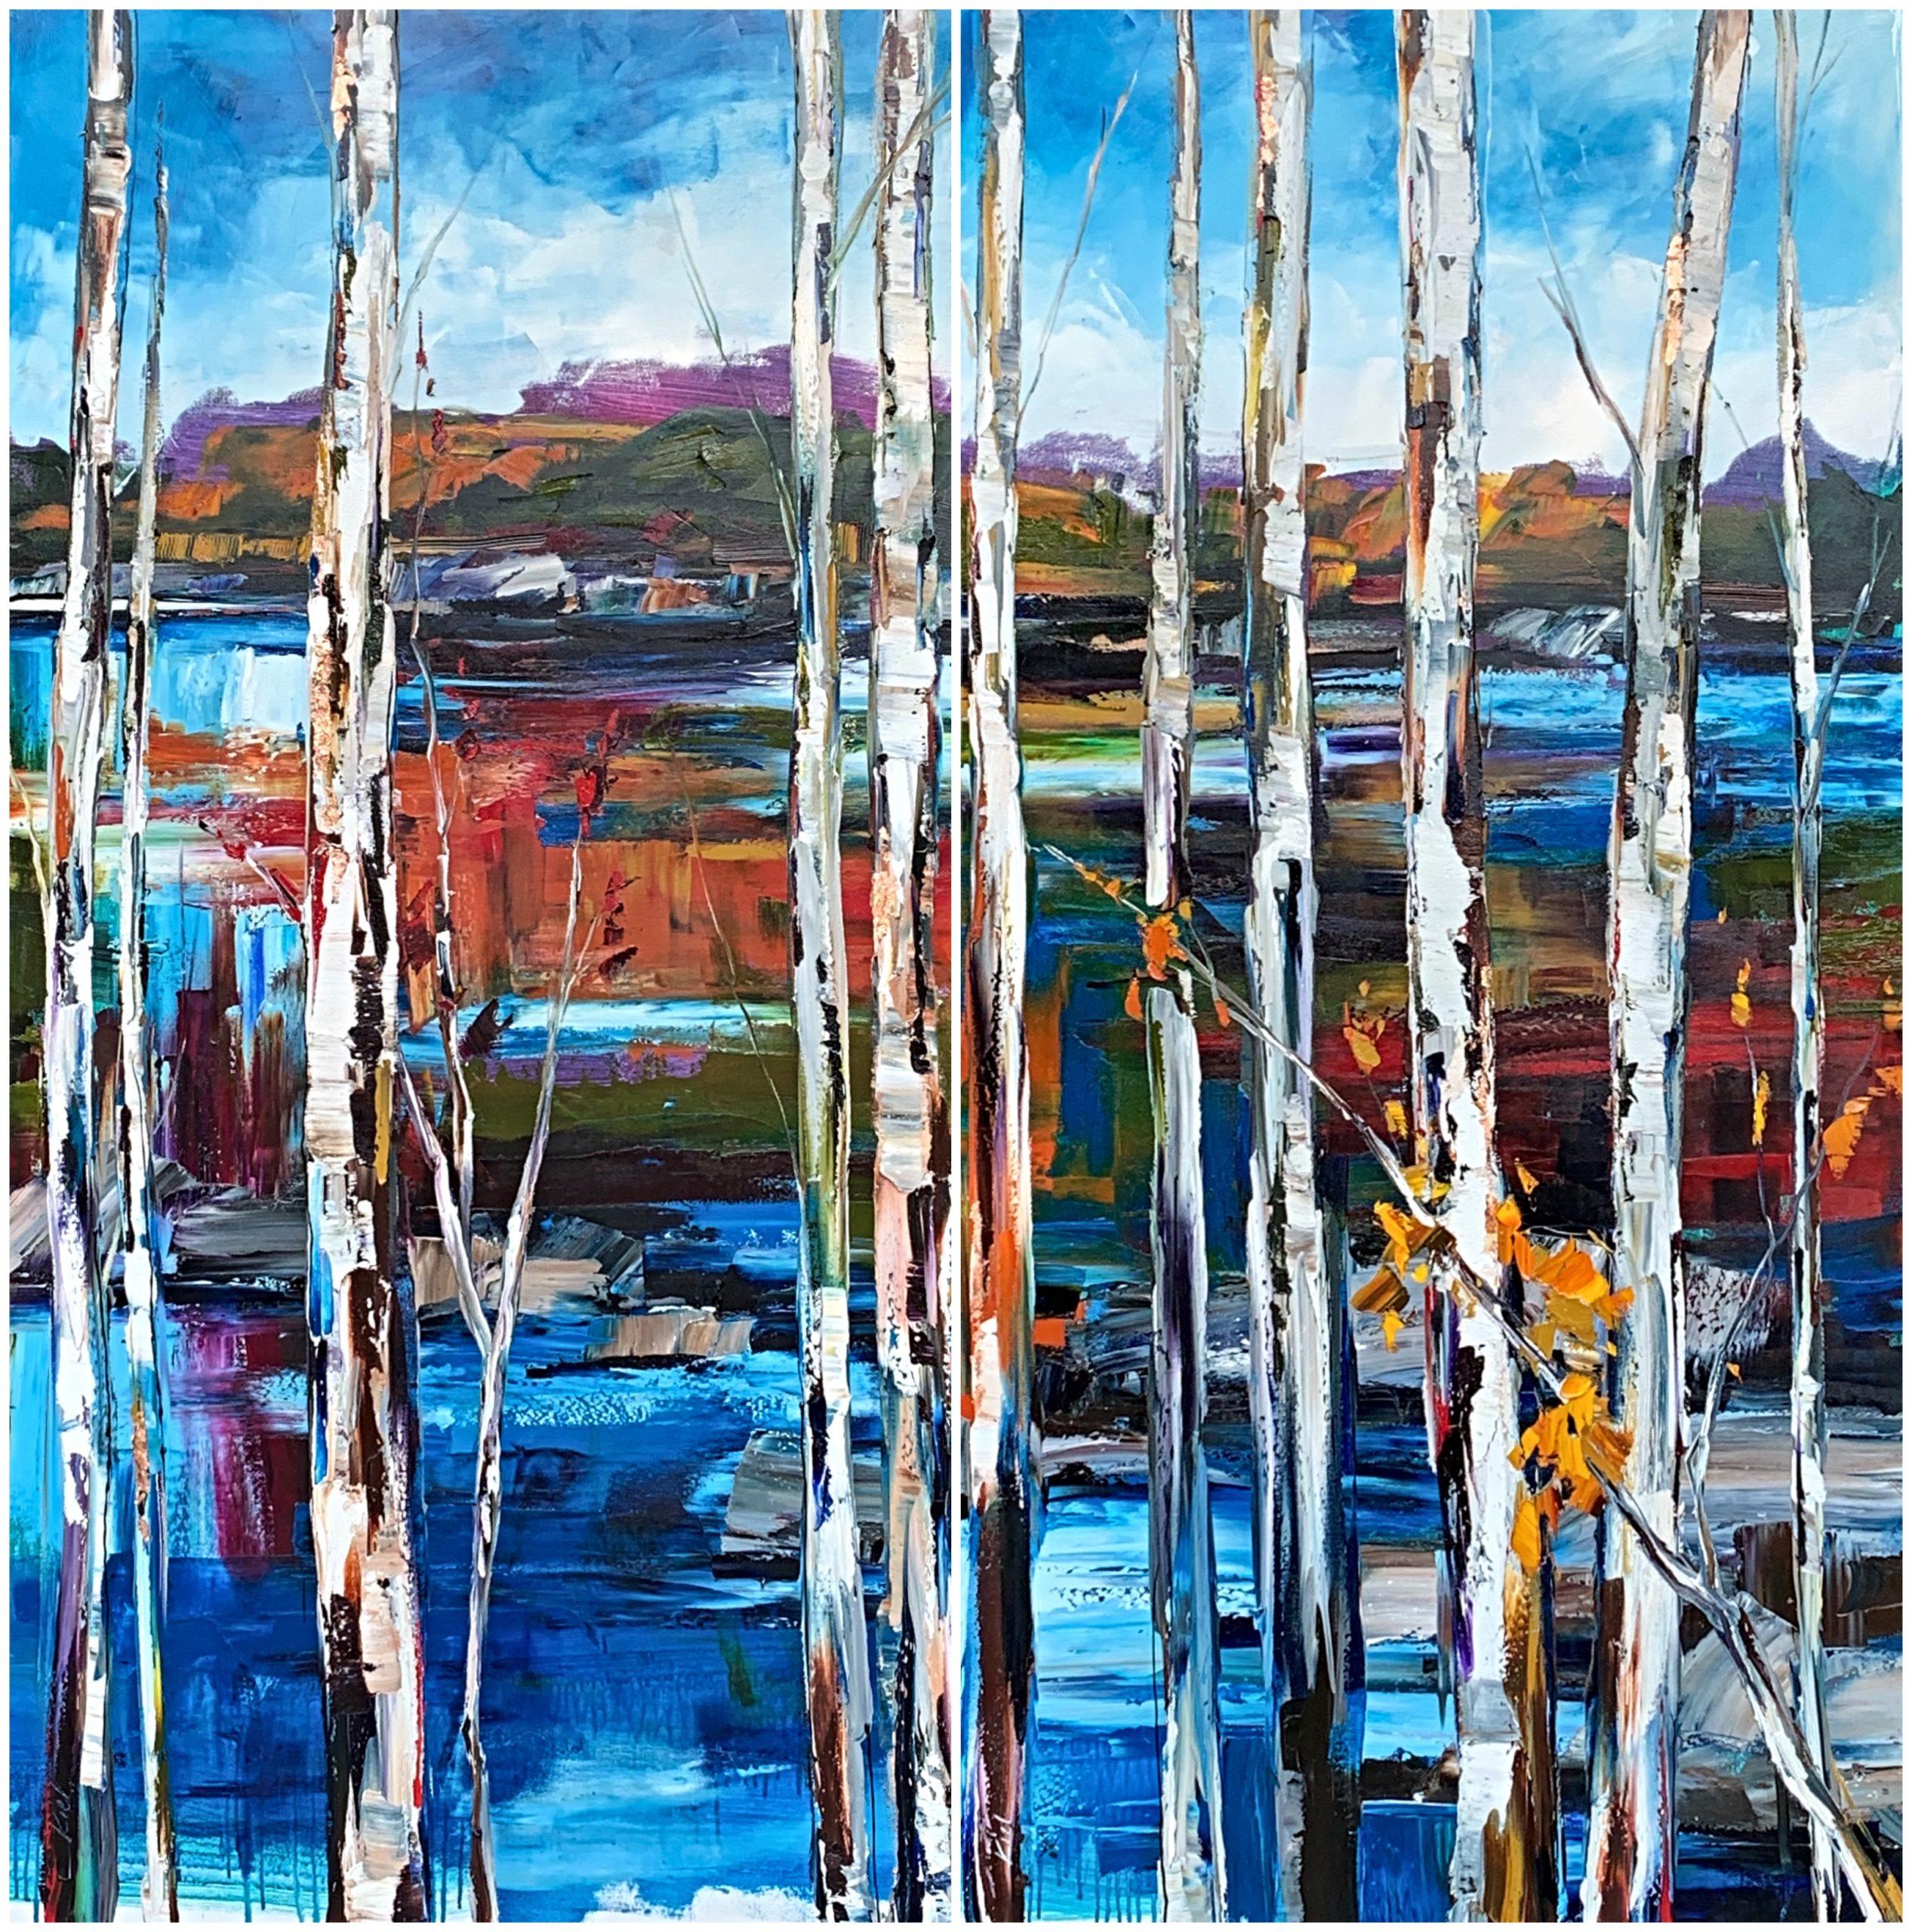 Follow My Tracks 2 + 3, mixed media landscape painting by Kimberly Kiel | Effusion Art Gallery + Cast Glass Studio, Invermere BC